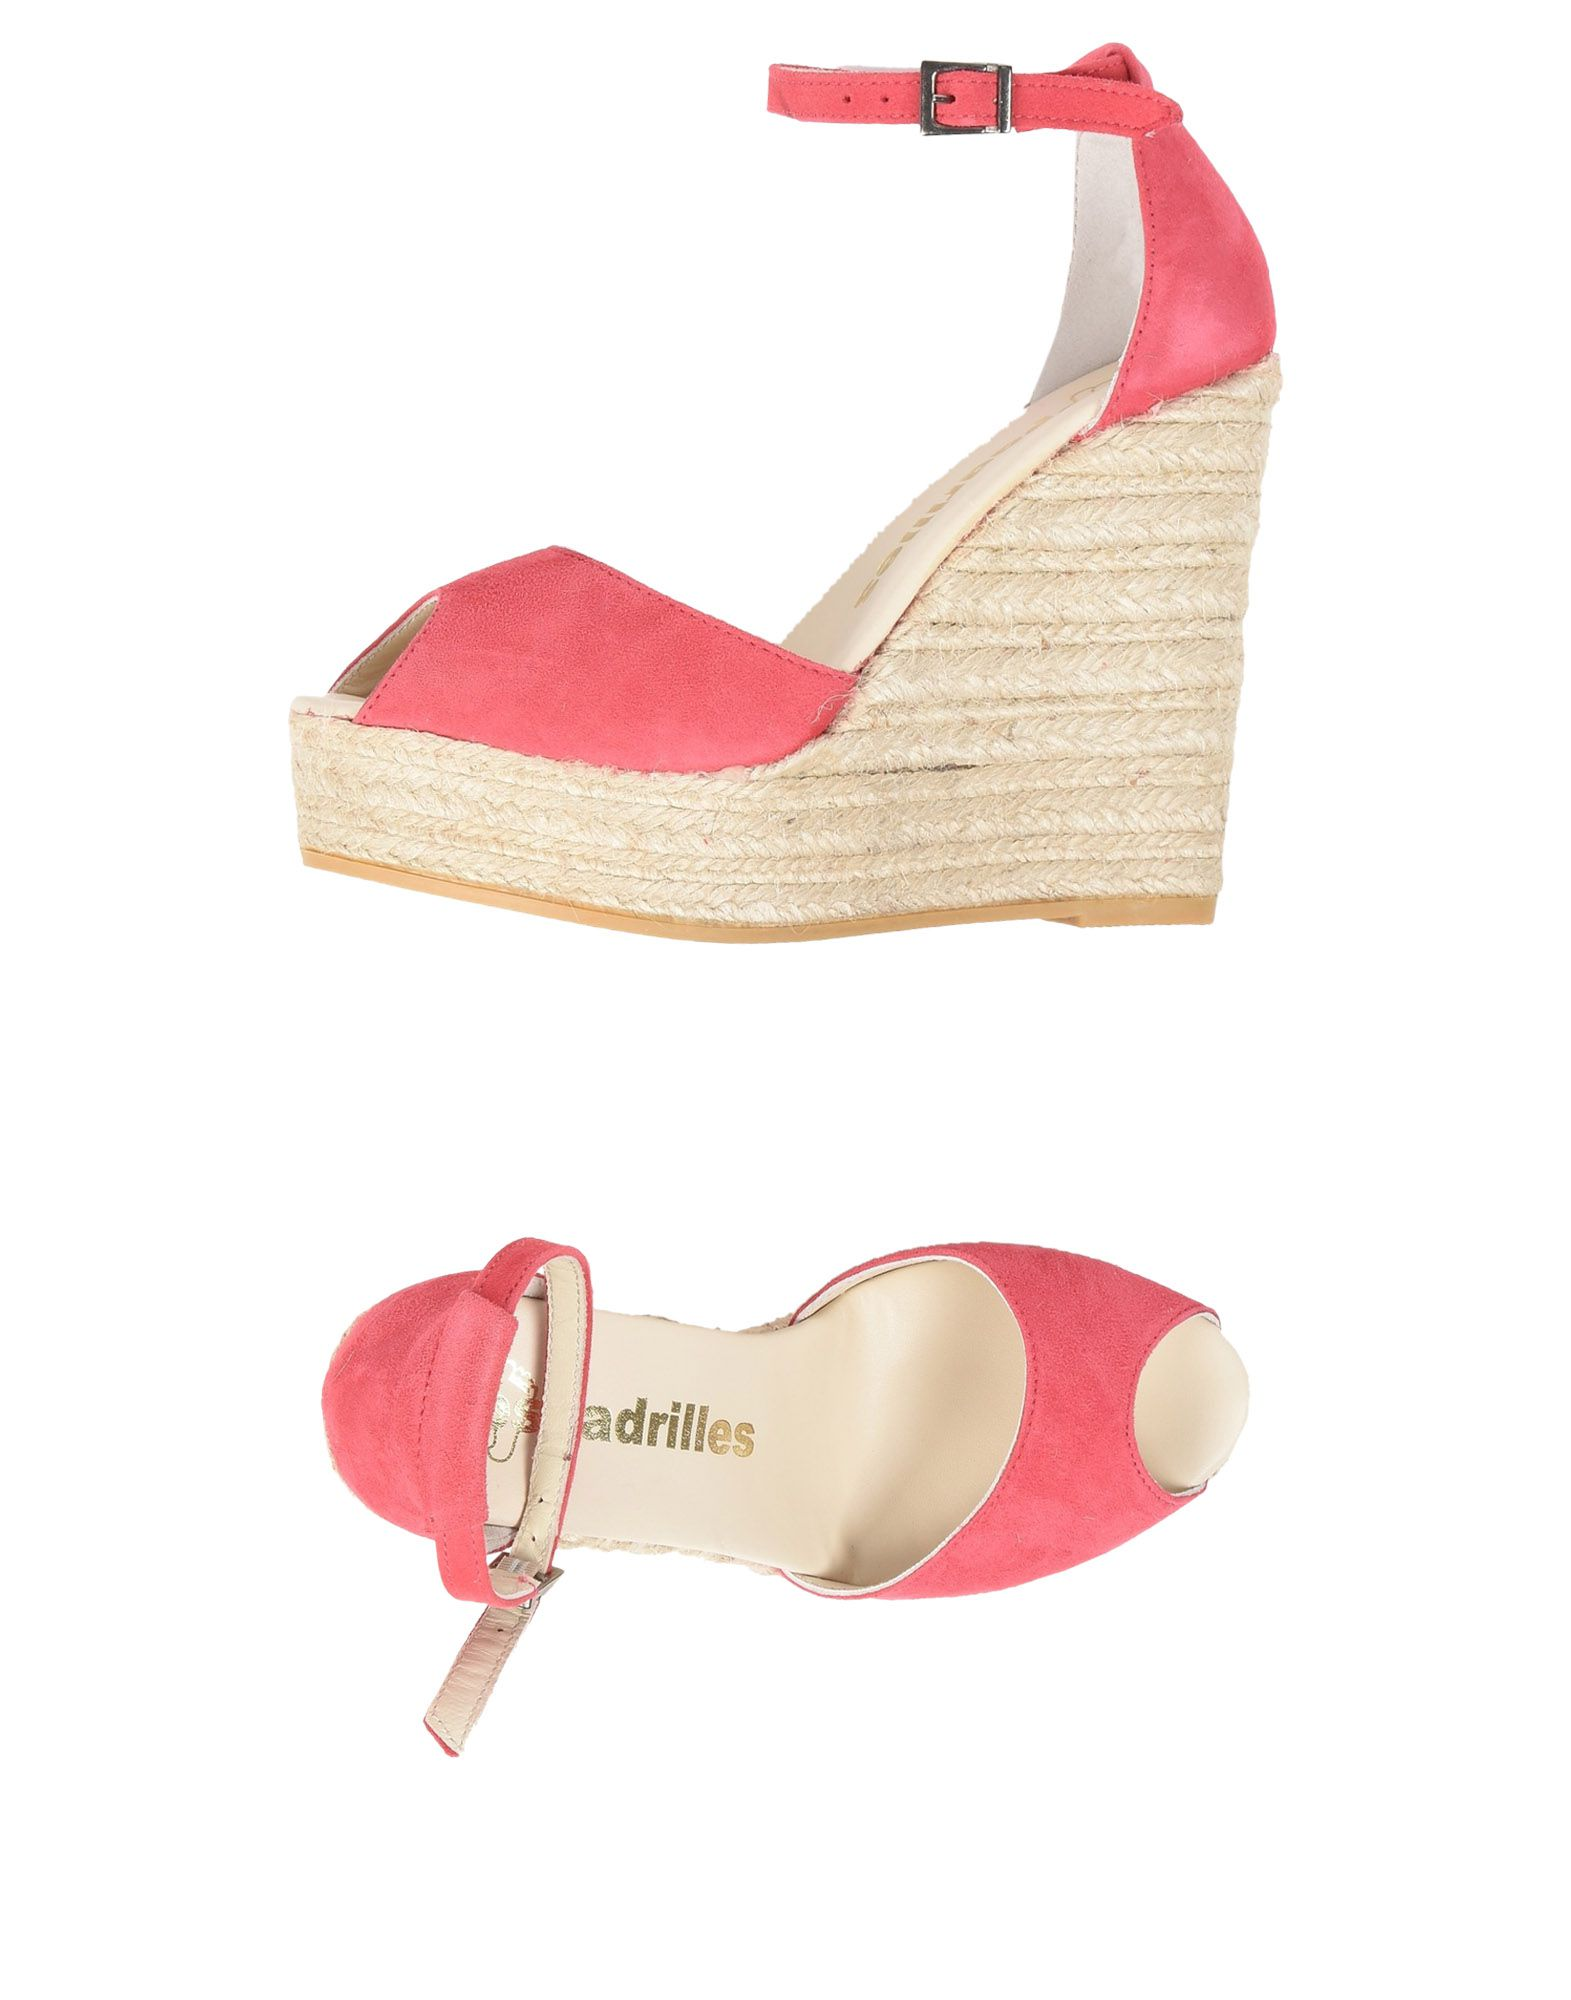 ESPADRILLES Сандалии 2017 fashion genuine leather white loafers women flats ladies creepers platform shoes woman espadrilles chaussure femme